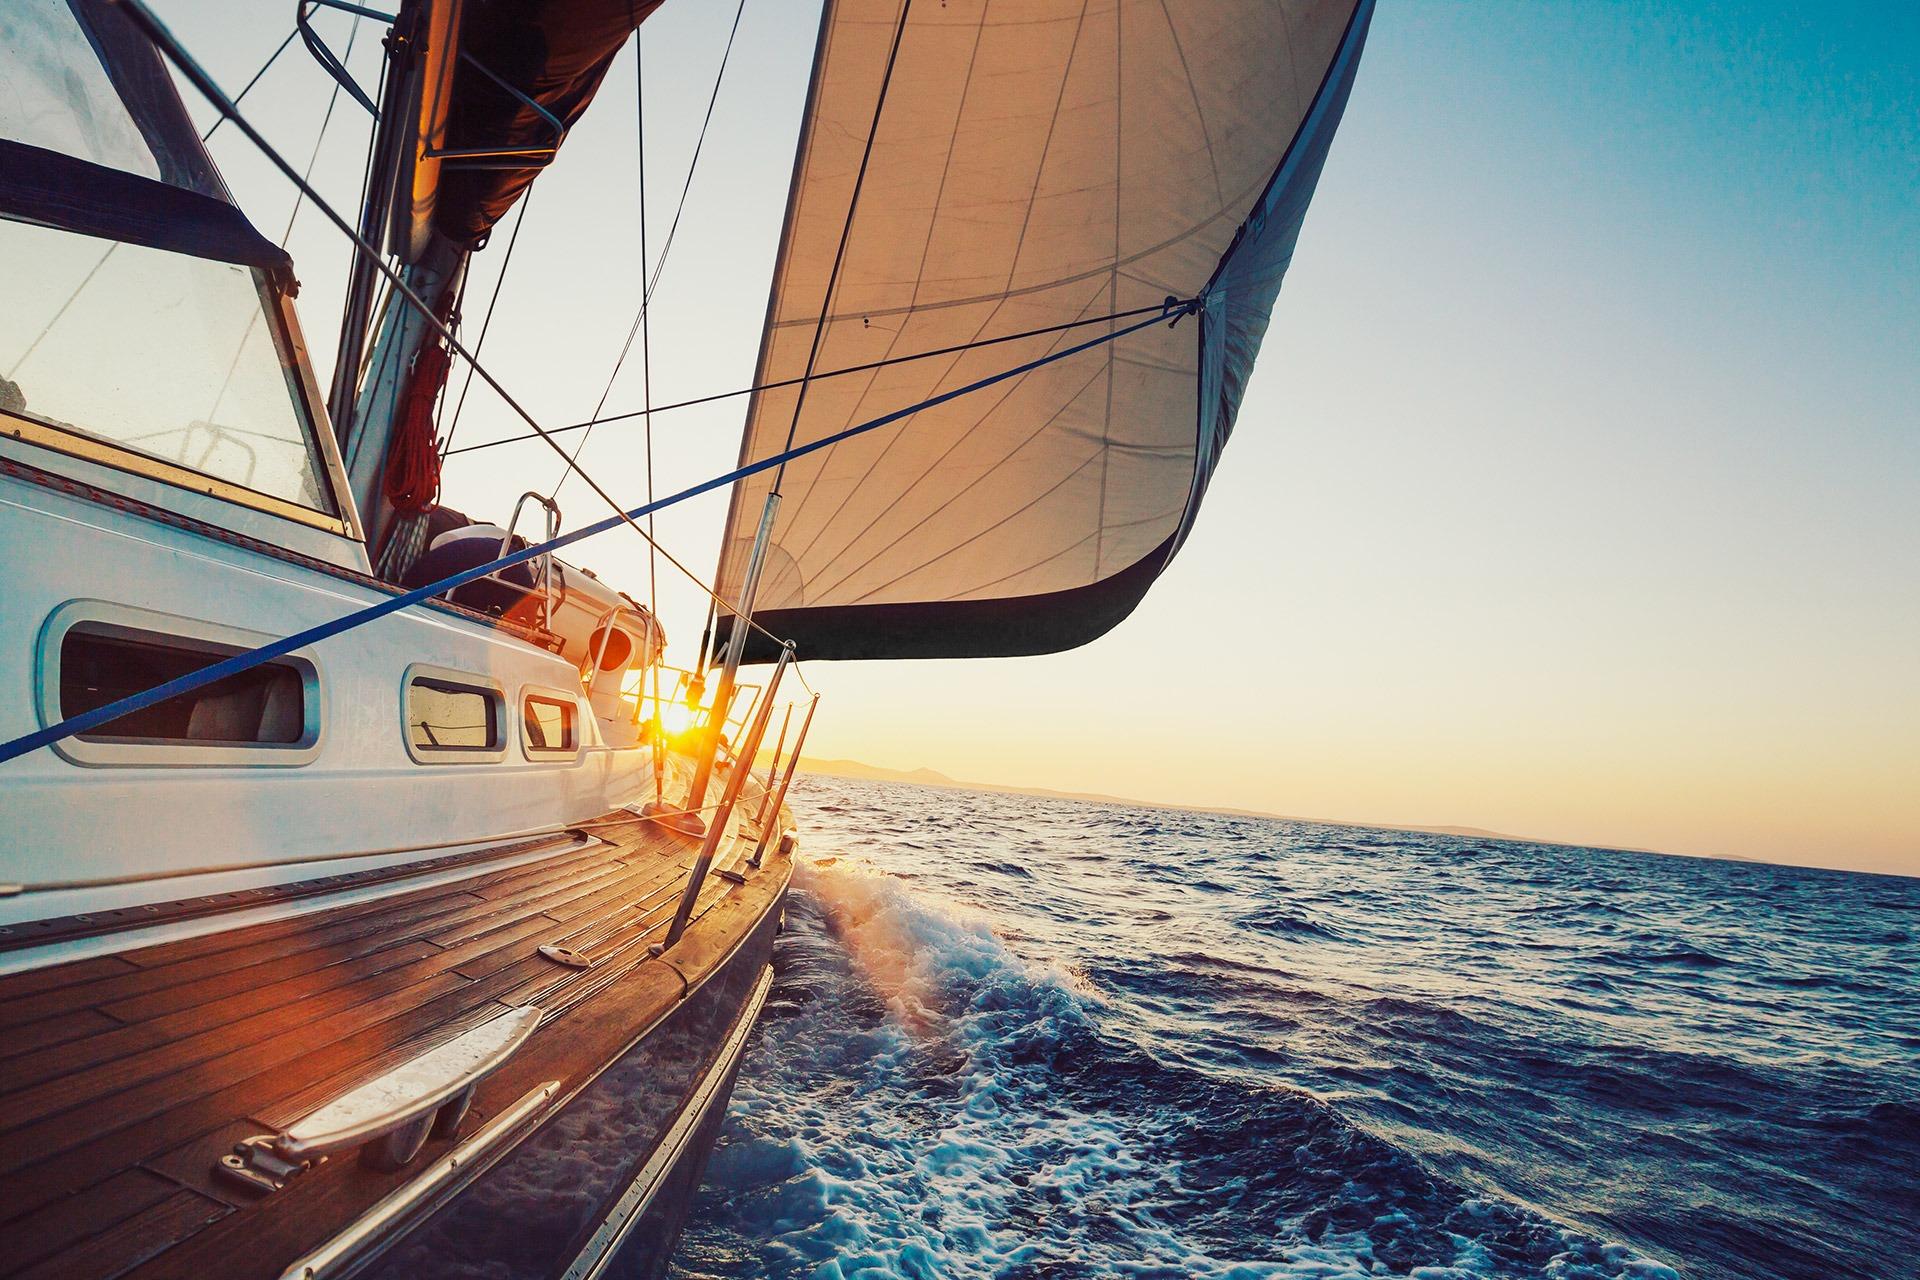 http://skivesejlklub.dk/wp-content/uploads/2019/02/sailing-PLVH62M.jpg